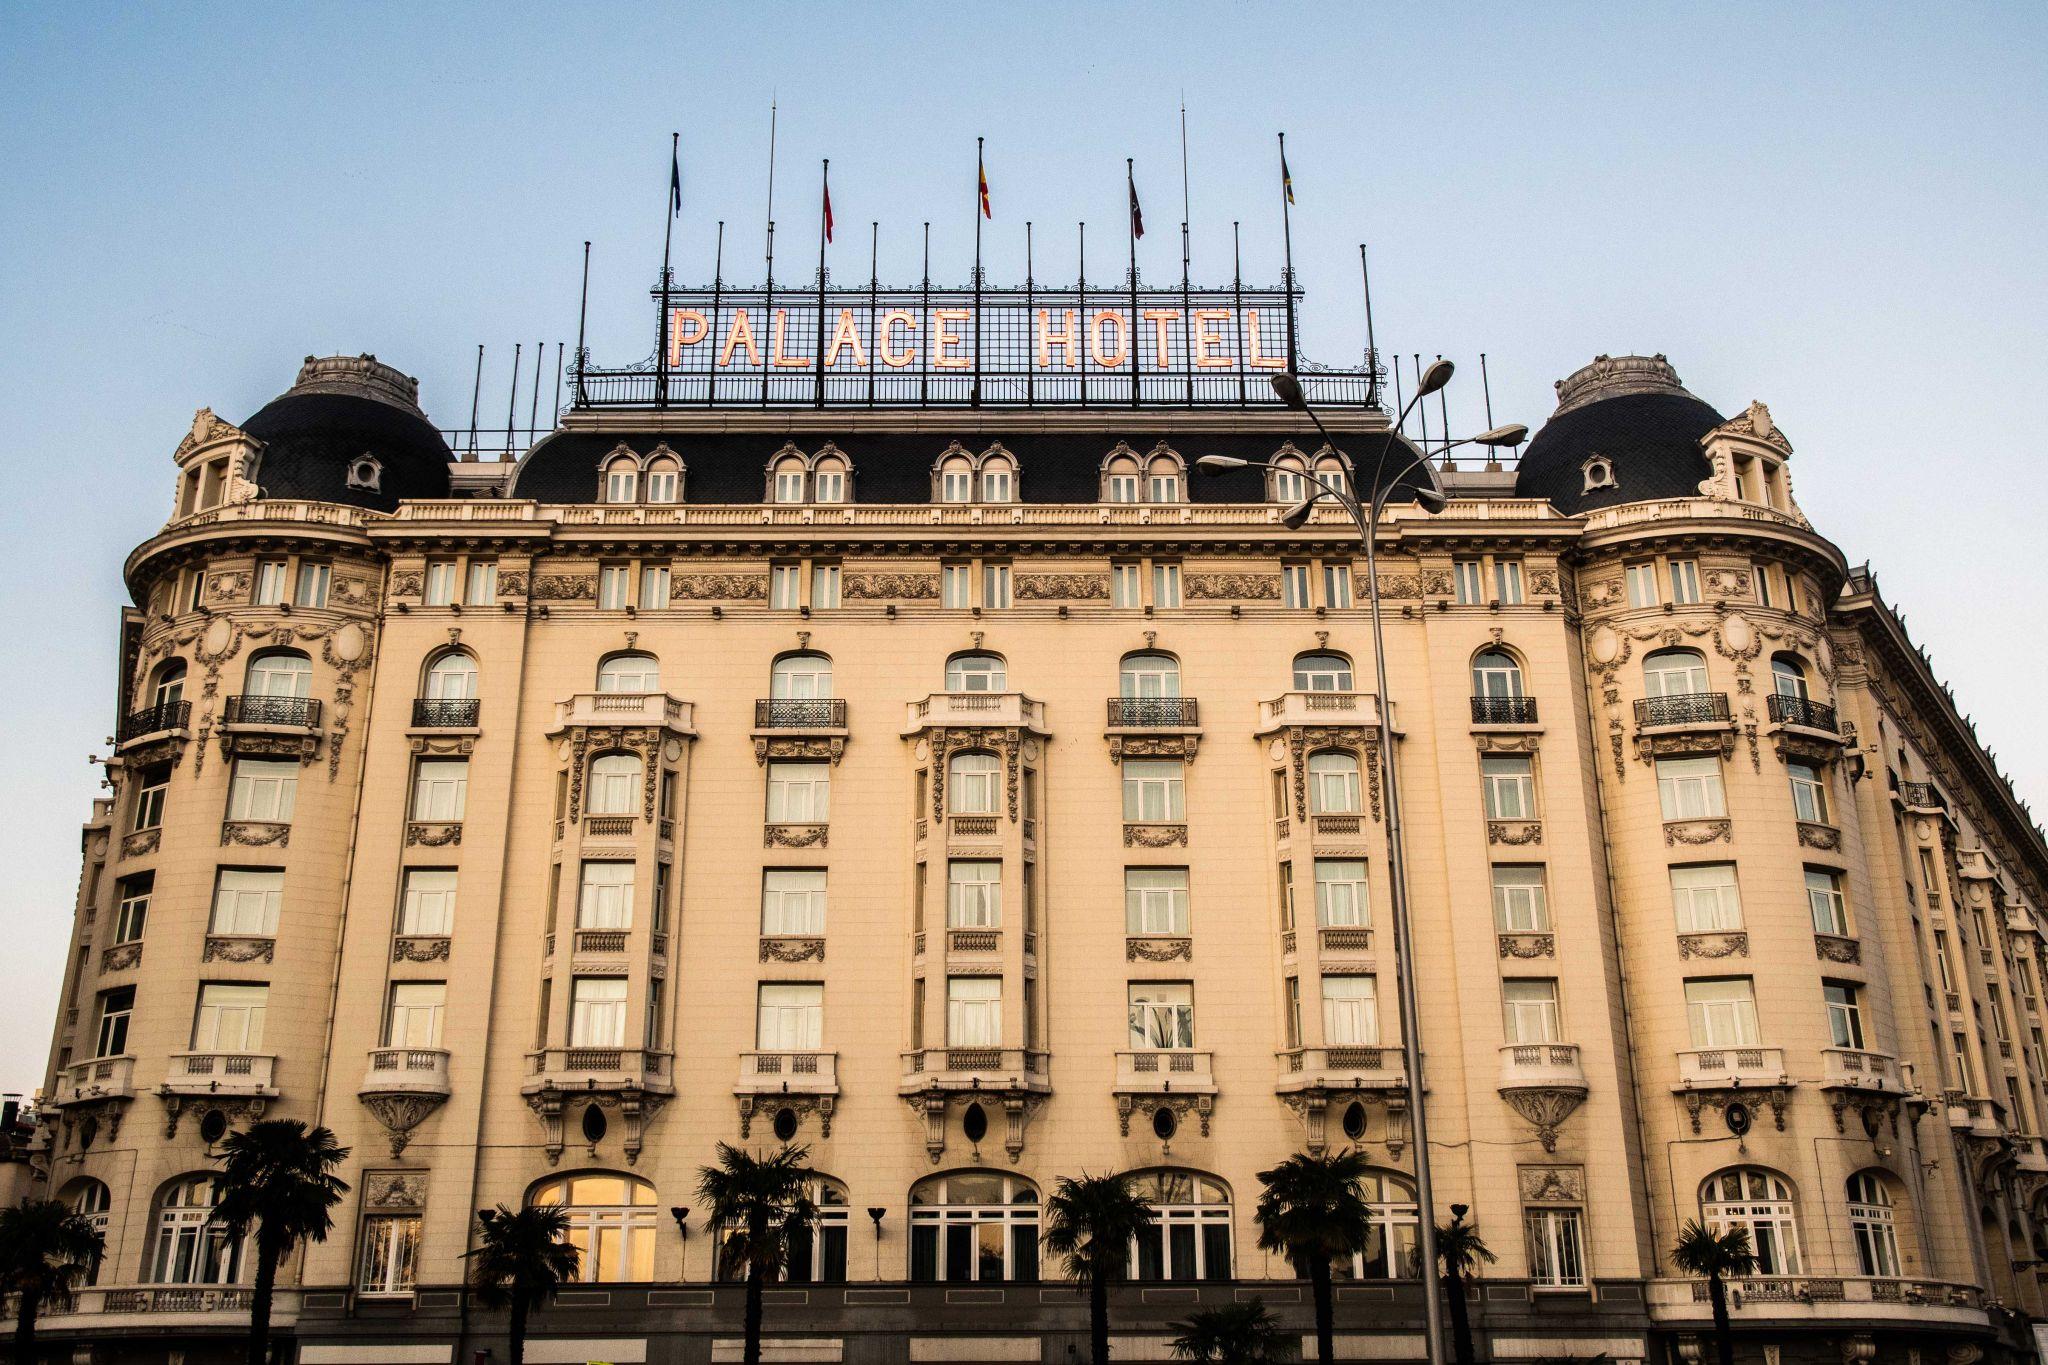 Westin Palace Madrid, Spain